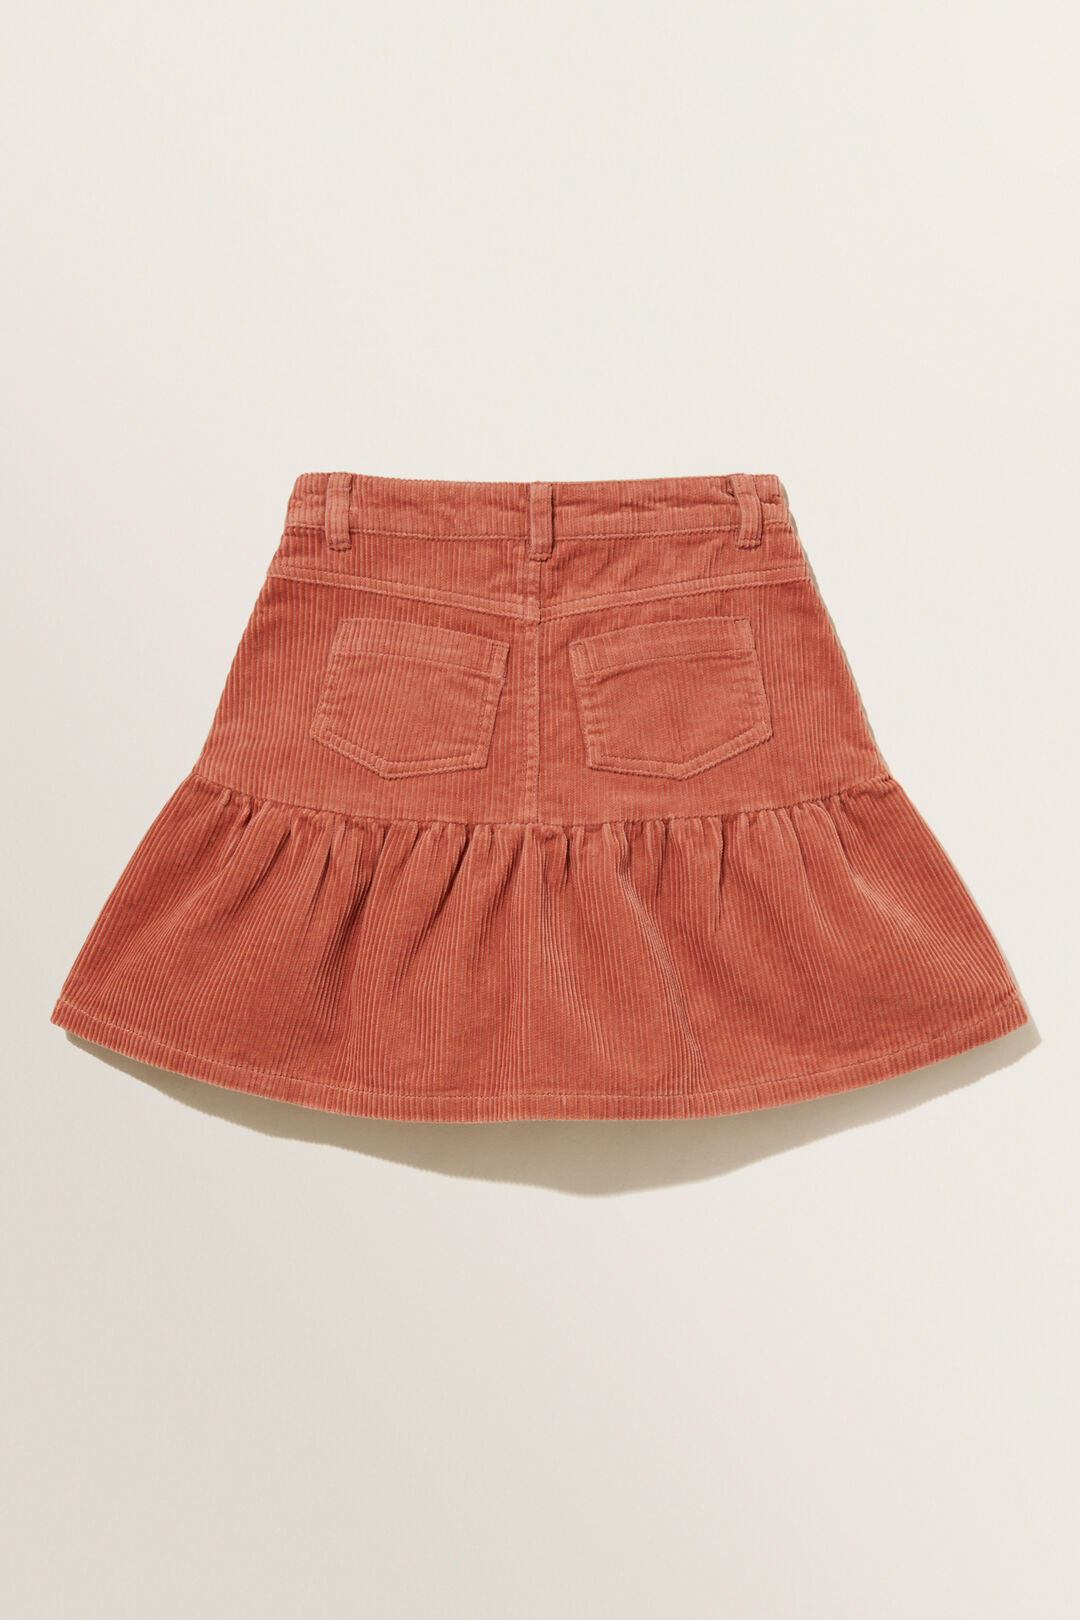 Corduroy Skirt  CLAY  hi-res